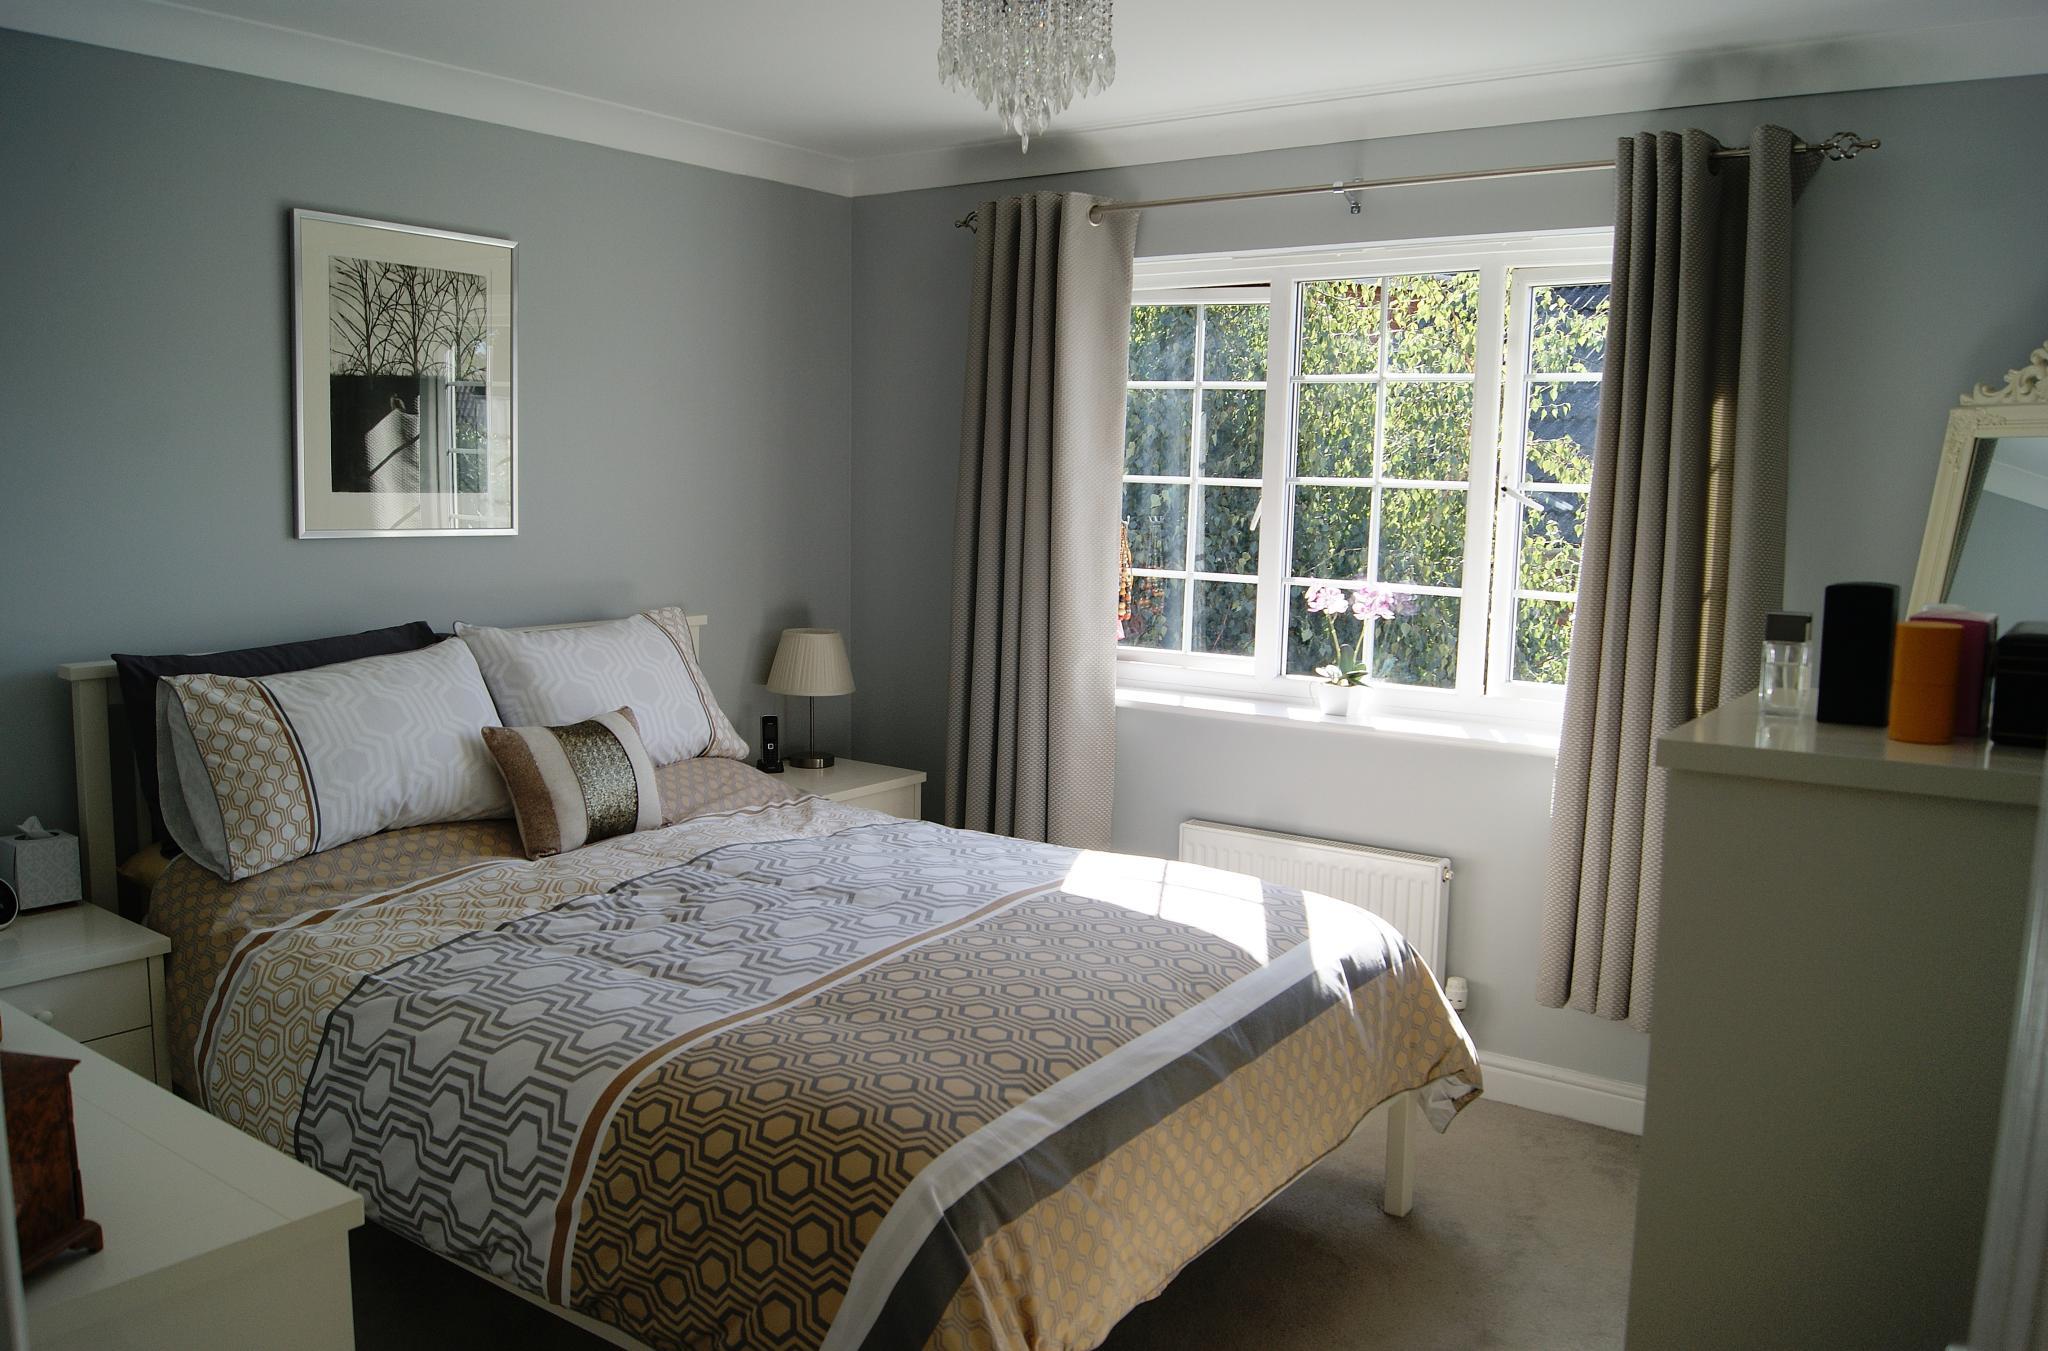 Property - Selway Drive, Bury St Edmunds, Suffolk